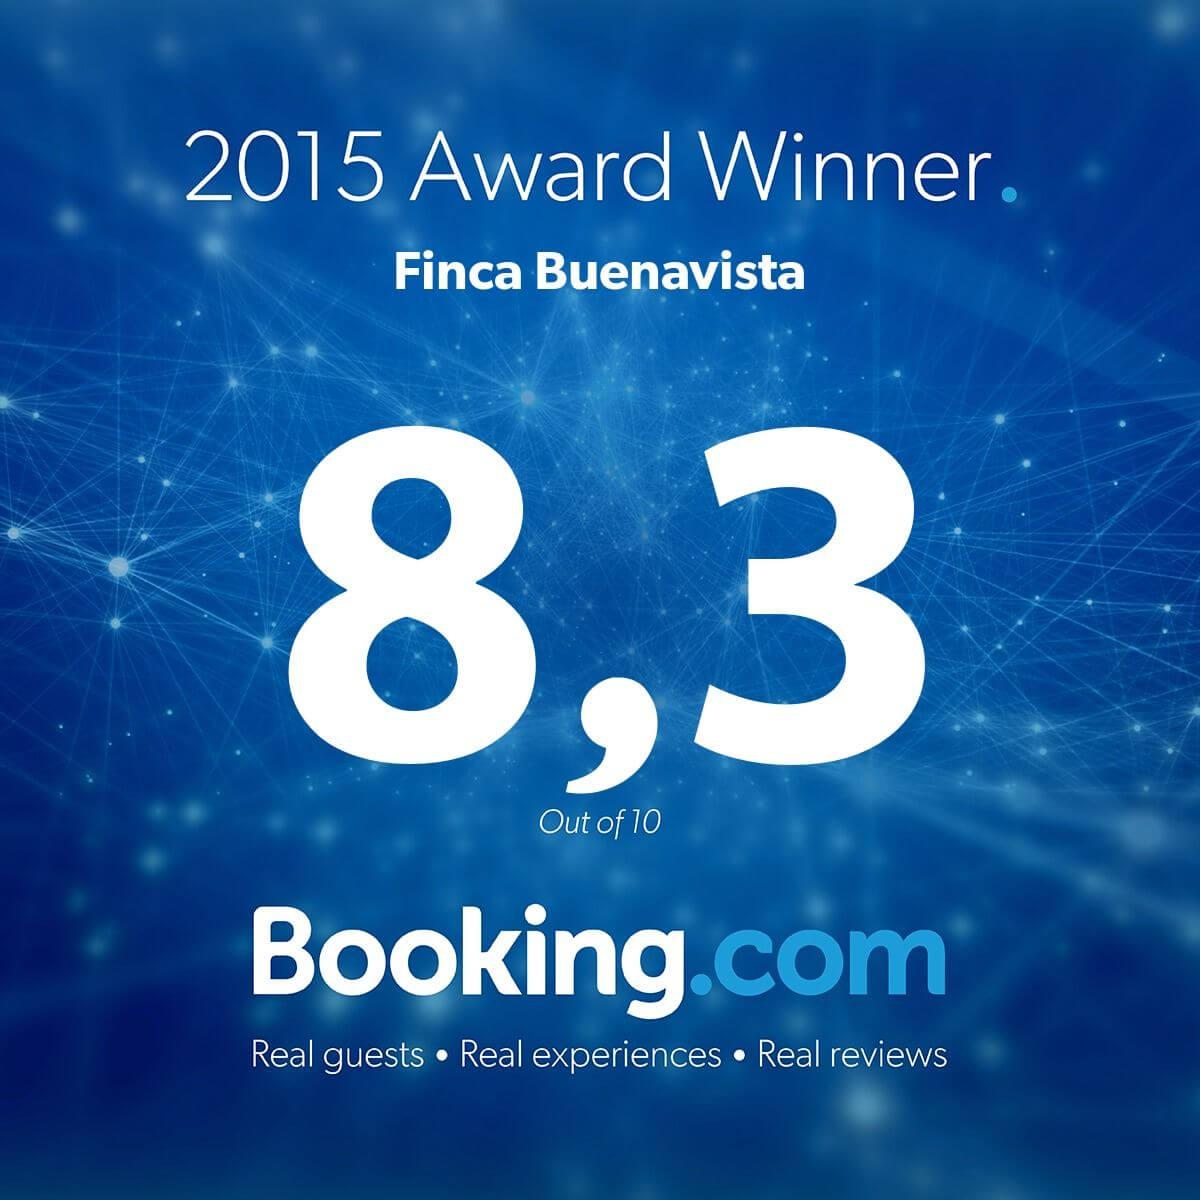 2015 Award Winner Booking.com